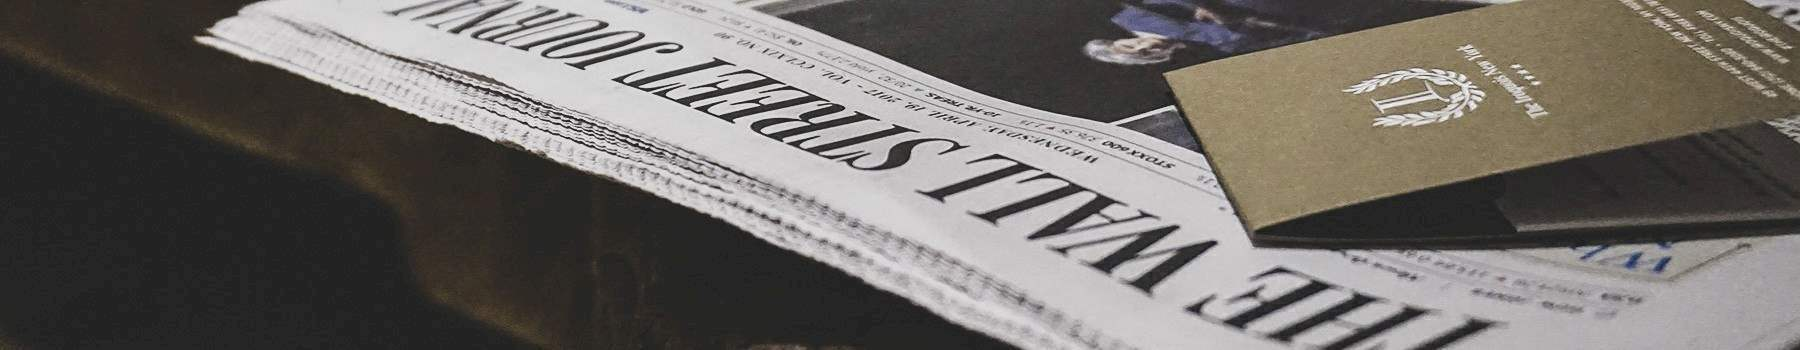 The Iroquois Hotel New York Press